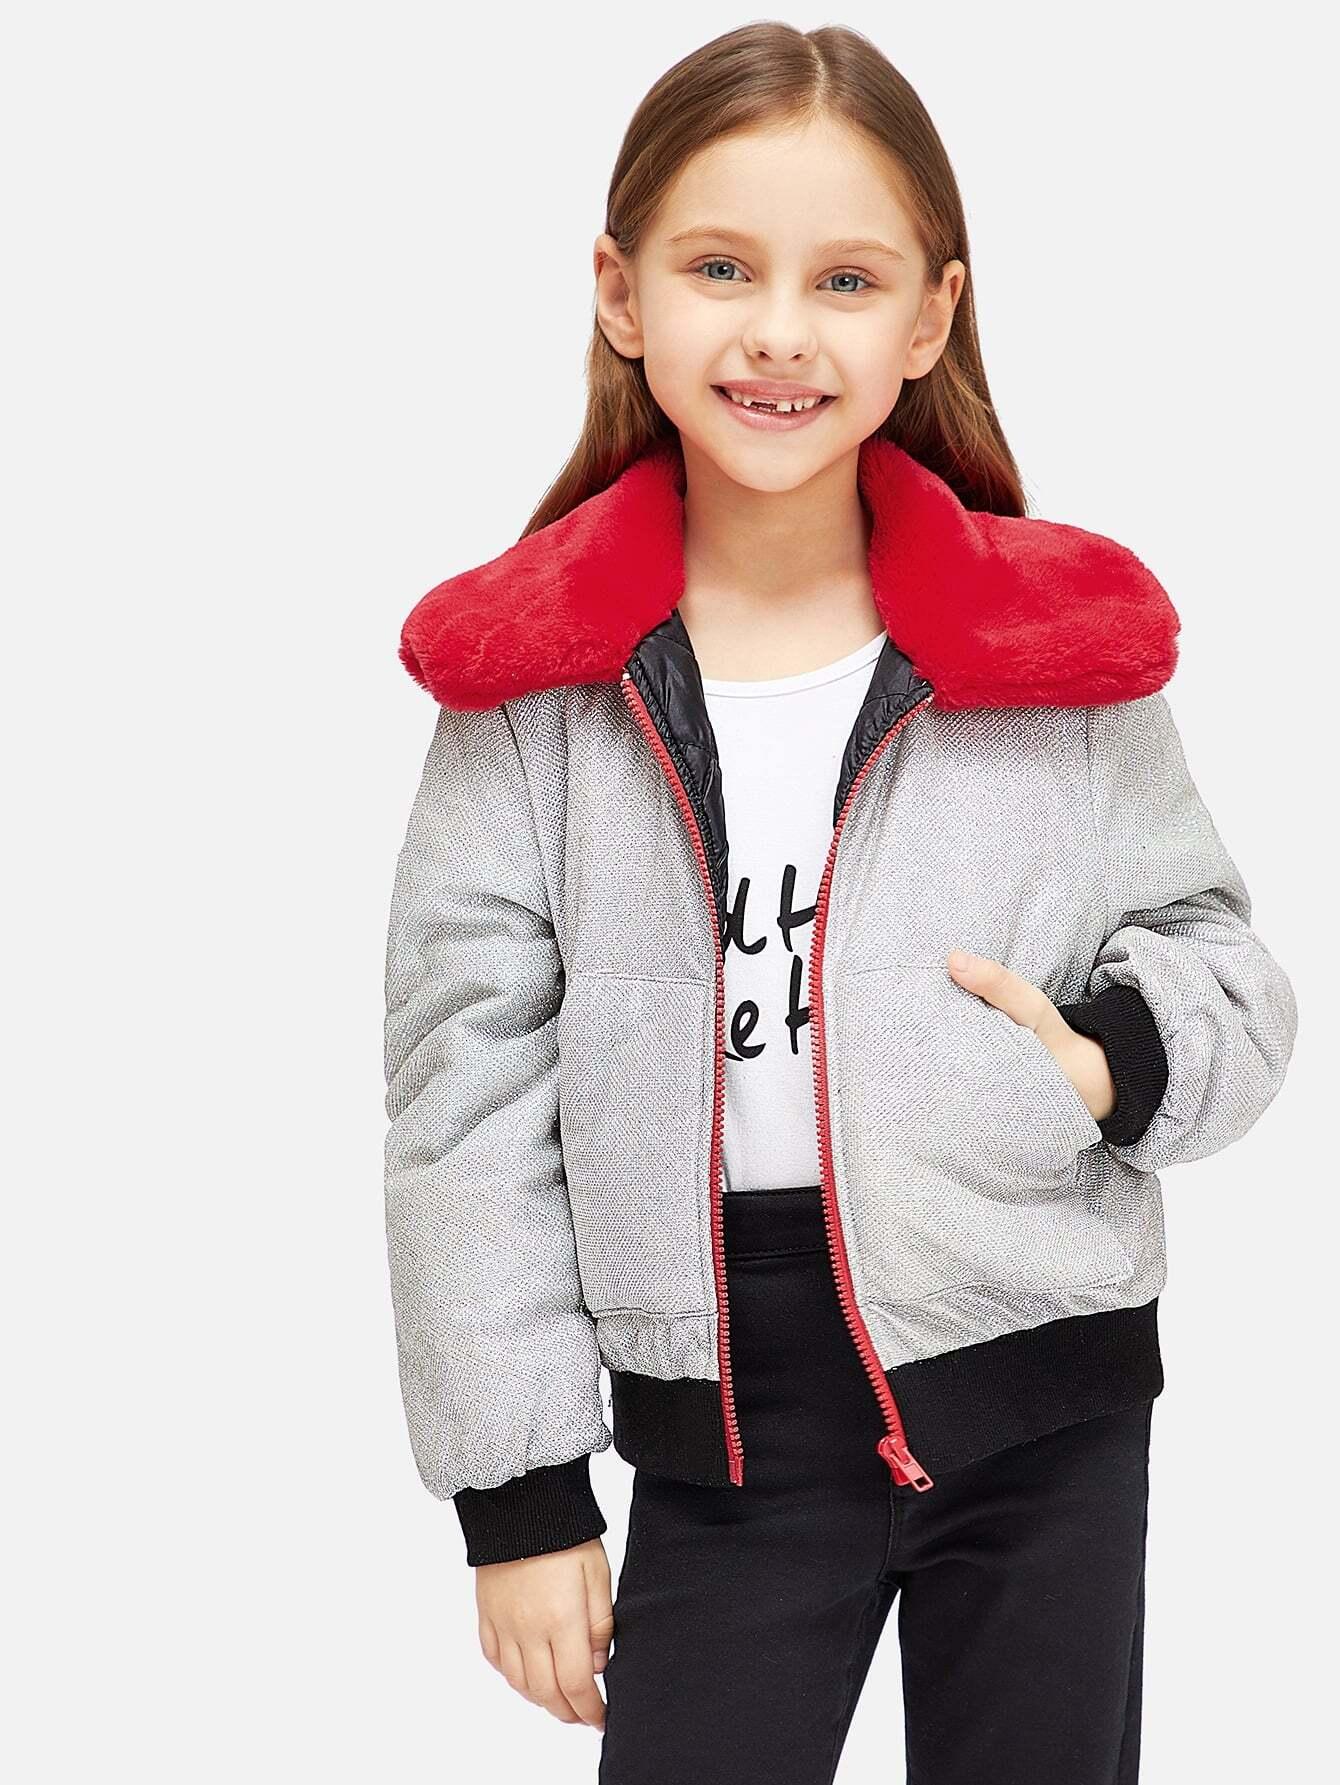 Girls Contrast Collar And Trim Zipper Up Jacket Girls Contrast Collar And Trim Zipper Up Jacket